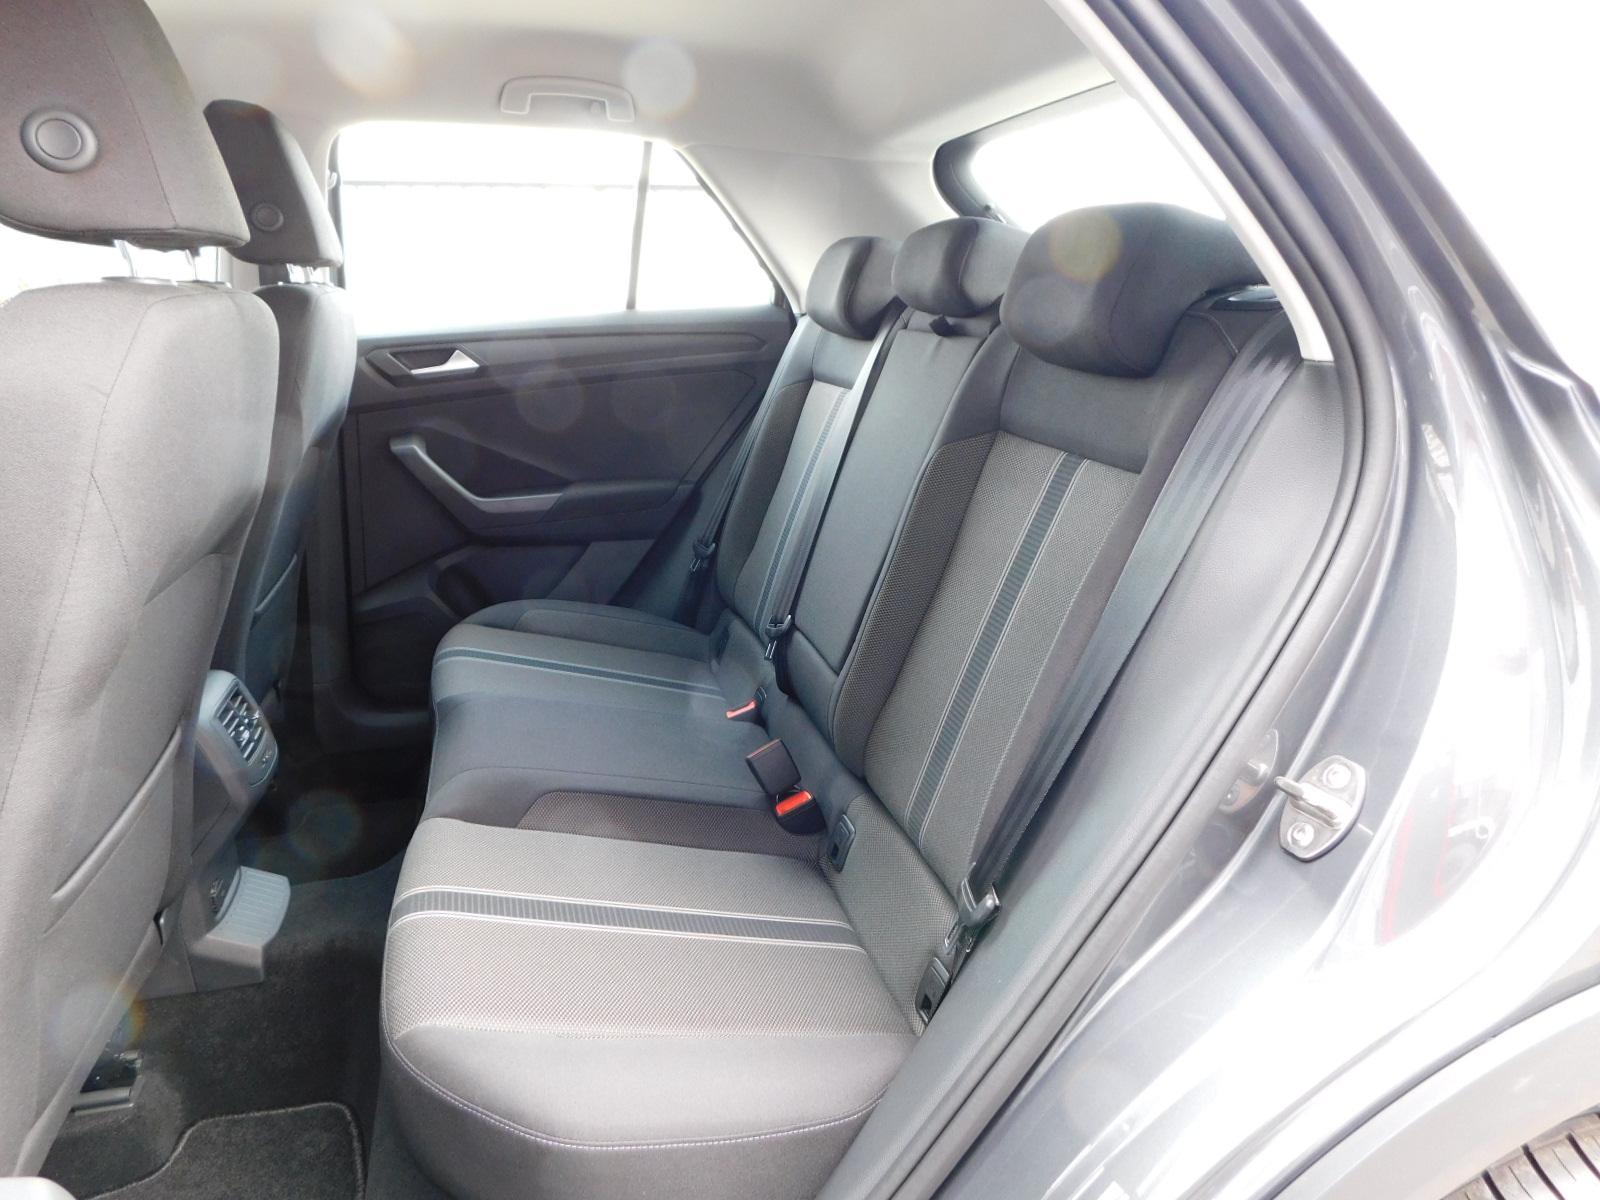 volkswagen t roc basis 1 0 tsi 115 ps euro6 wltp klima lane assist front assist bluetooth 6 5. Black Bedroom Furniture Sets. Home Design Ideas